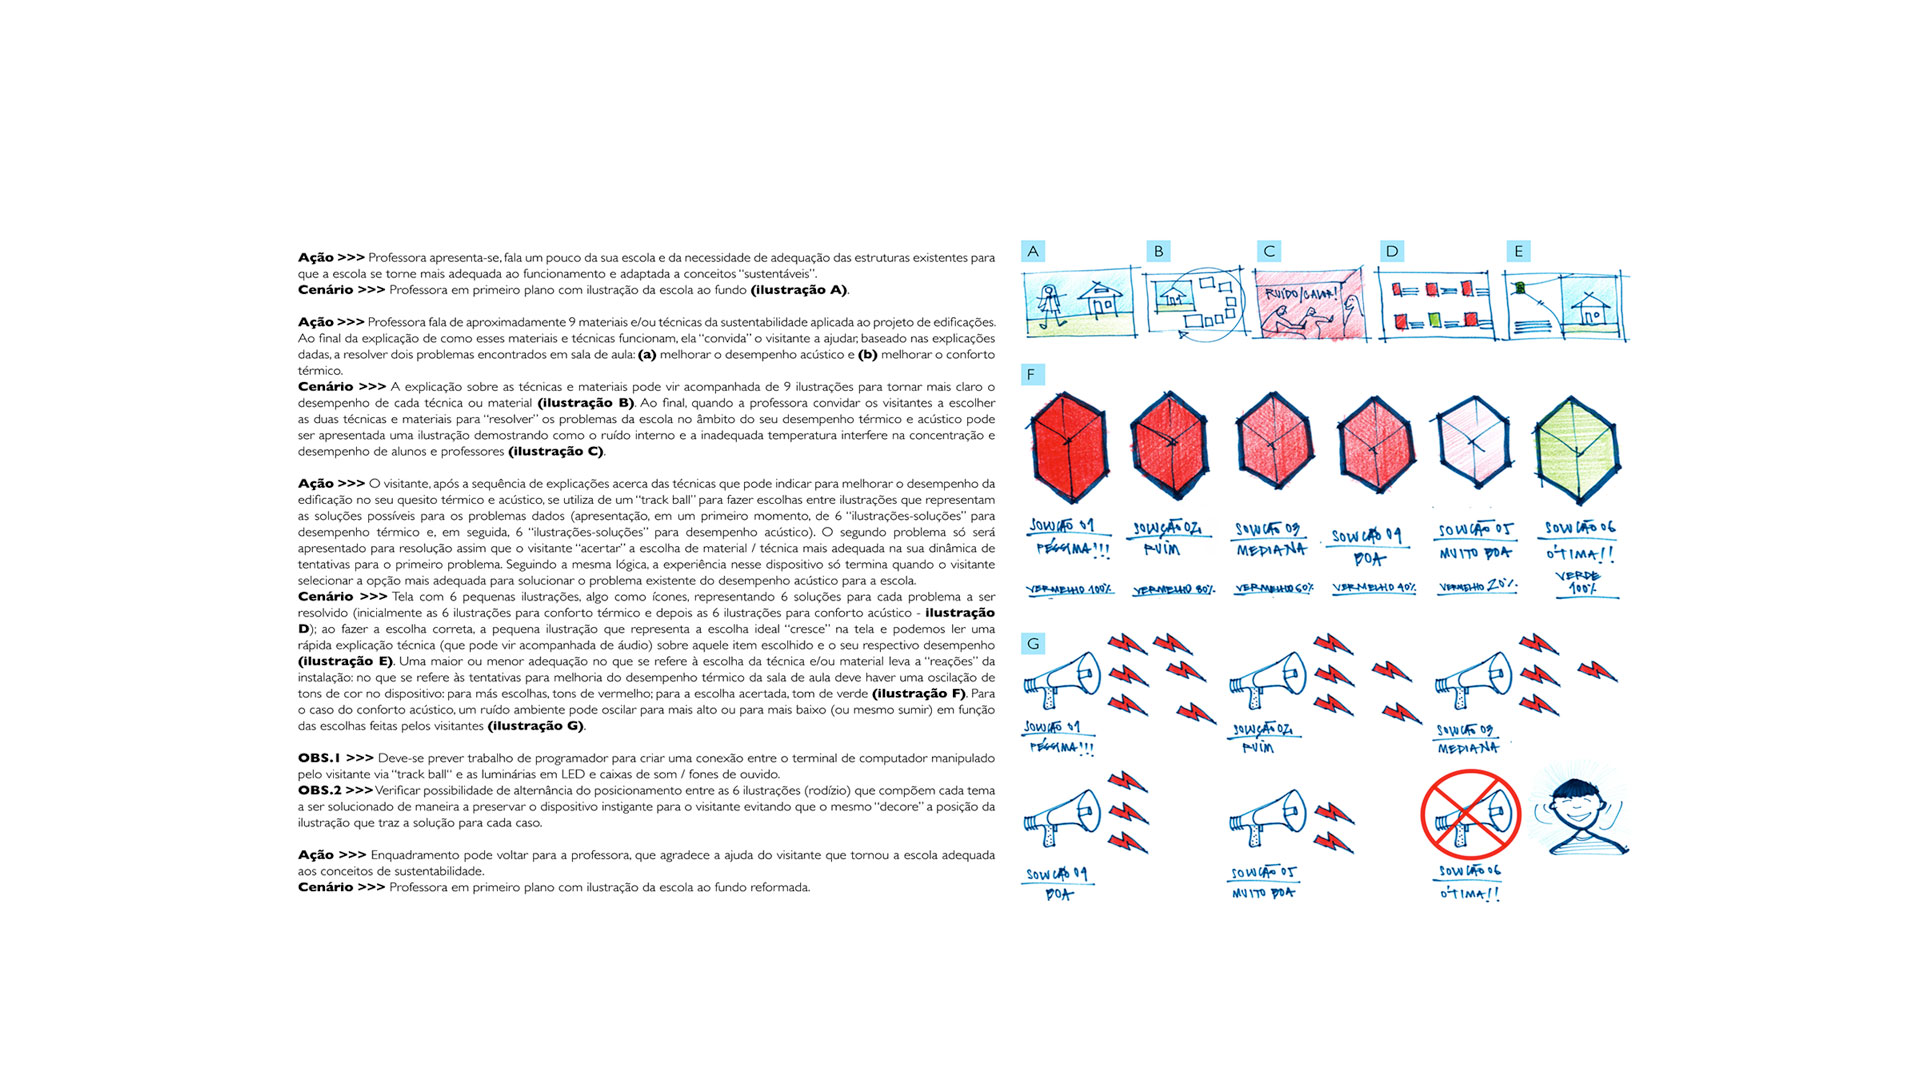 2-IPTI-interface-interacao-'ESCOLA-SUSTENTÁVEL'